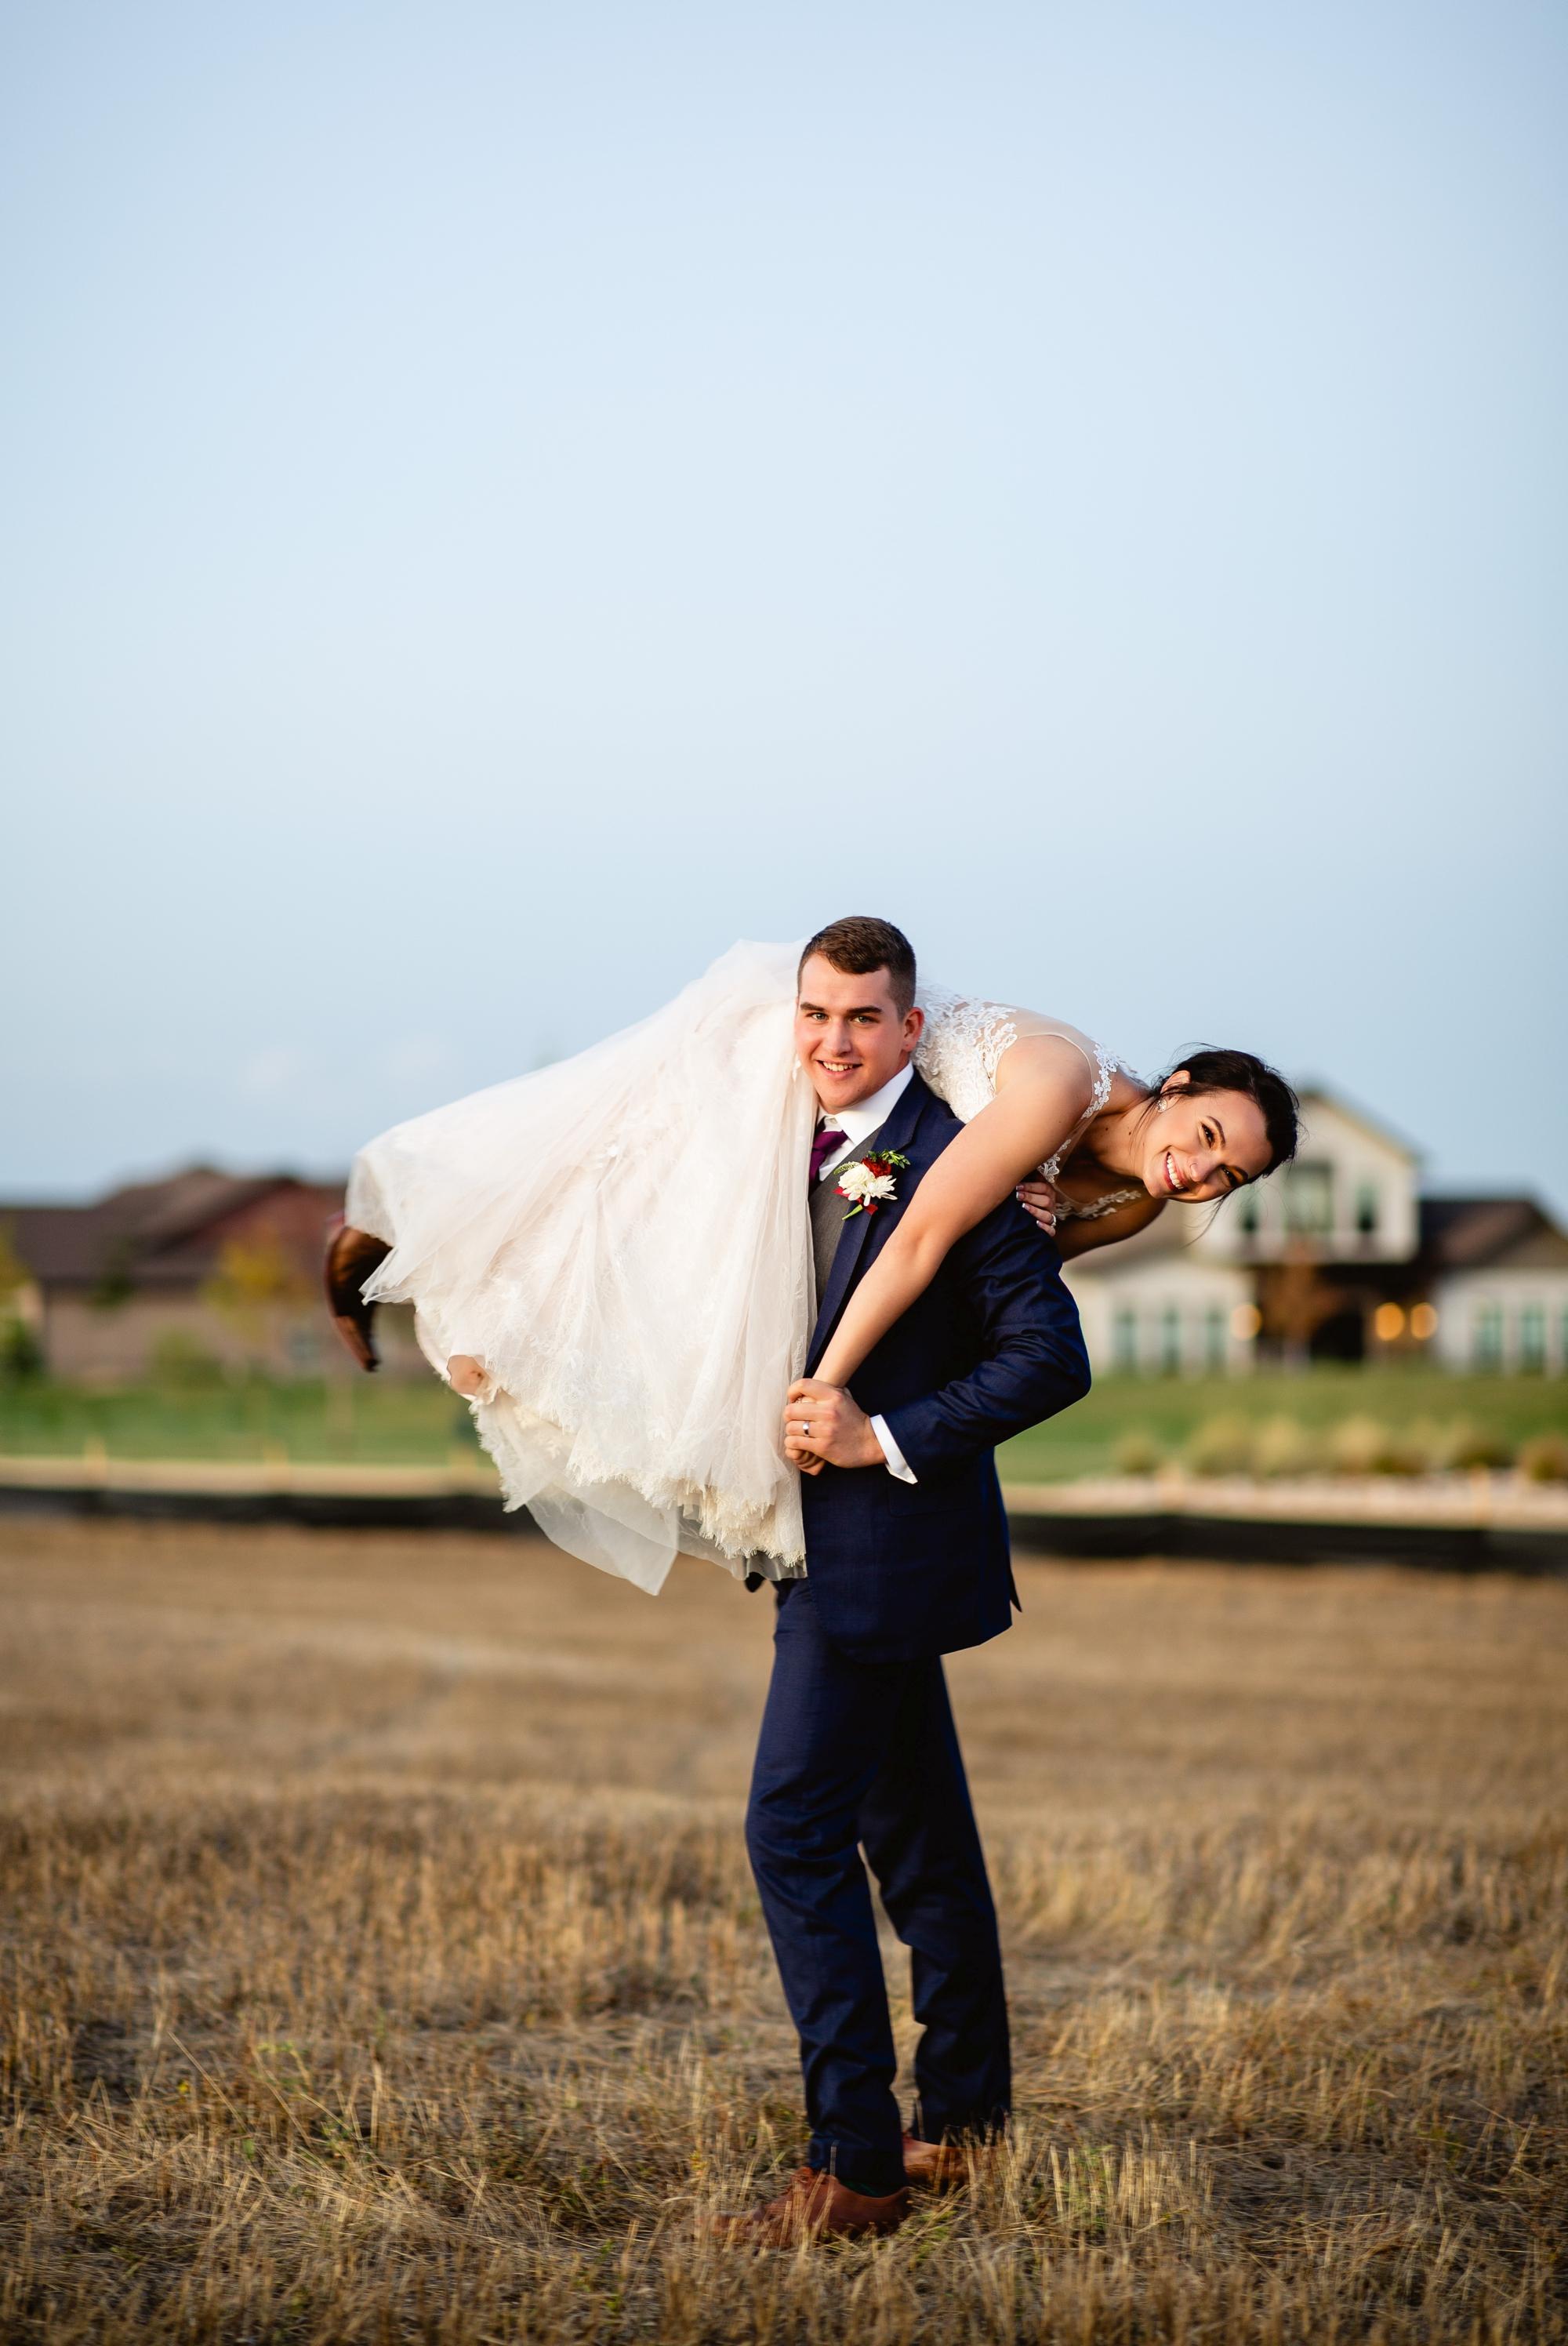 Windsor Big Red Barn Wedding in 2020   Colorado wedding ...